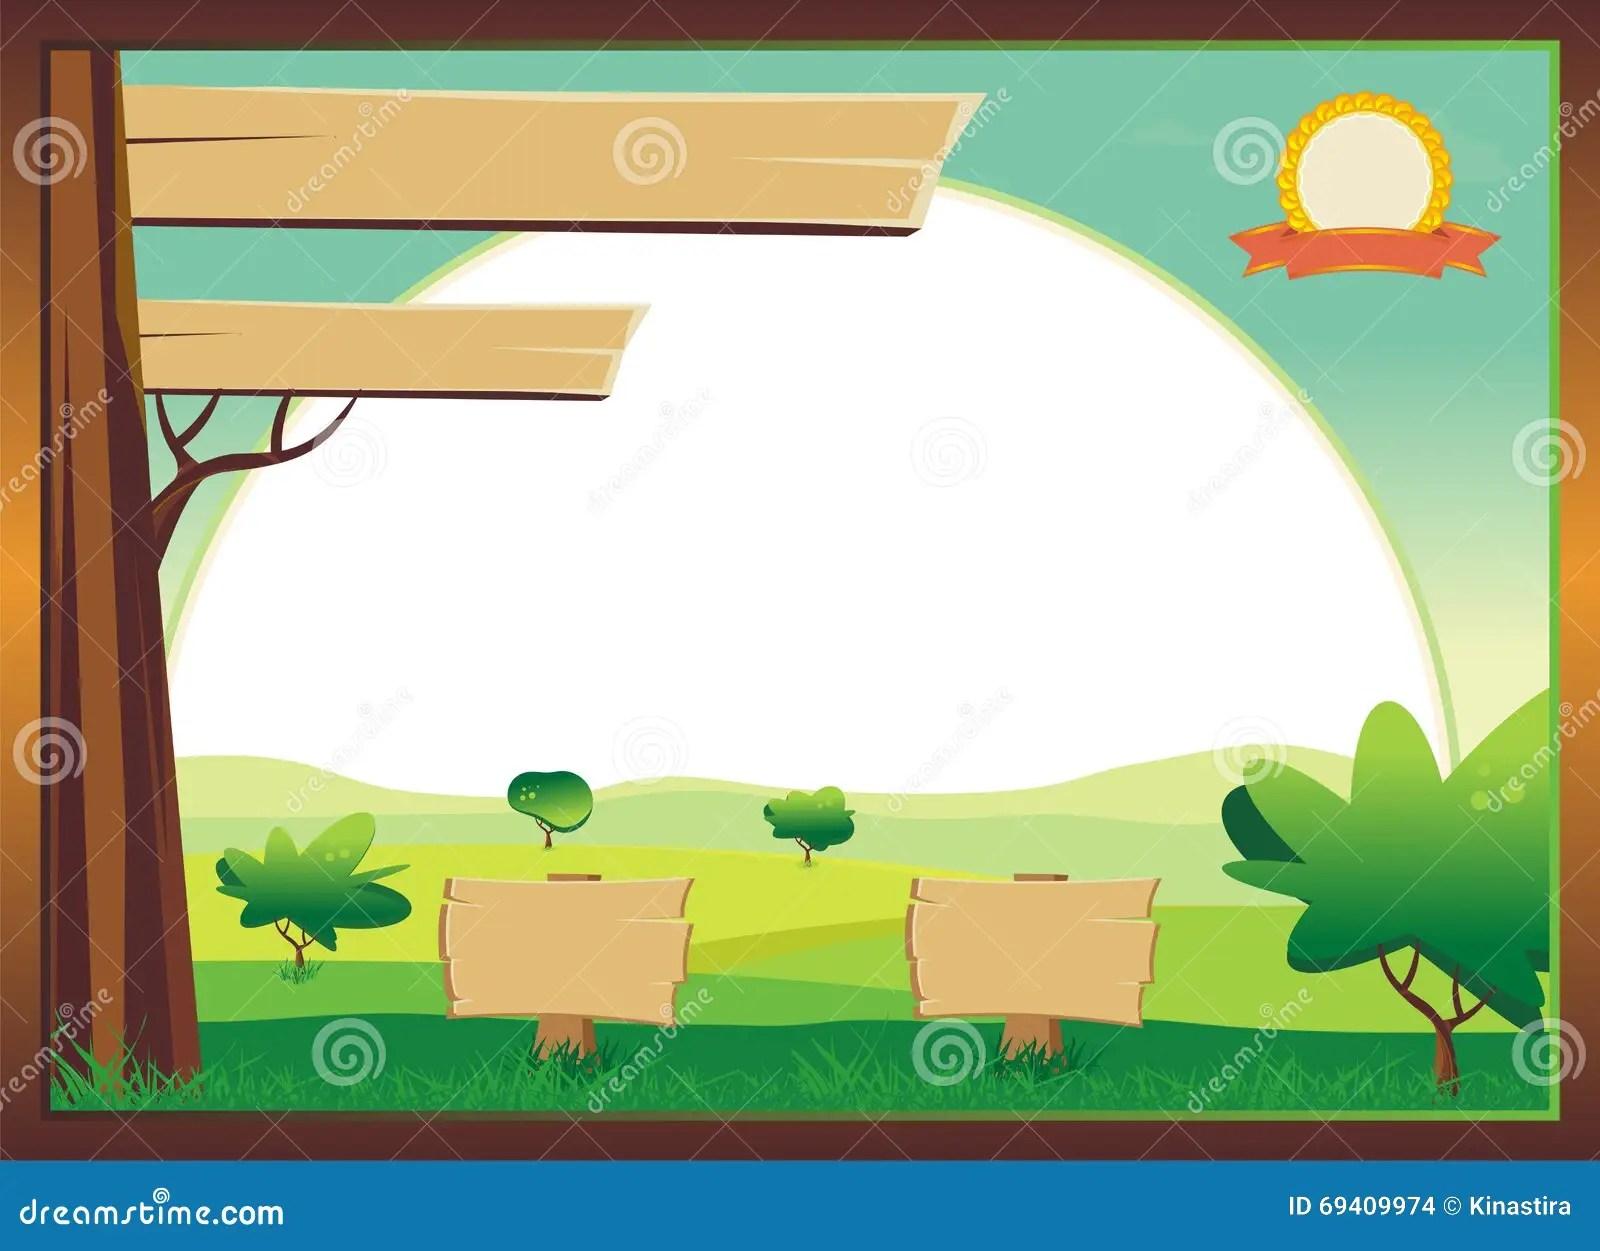 Stock Images Preschool Elementary